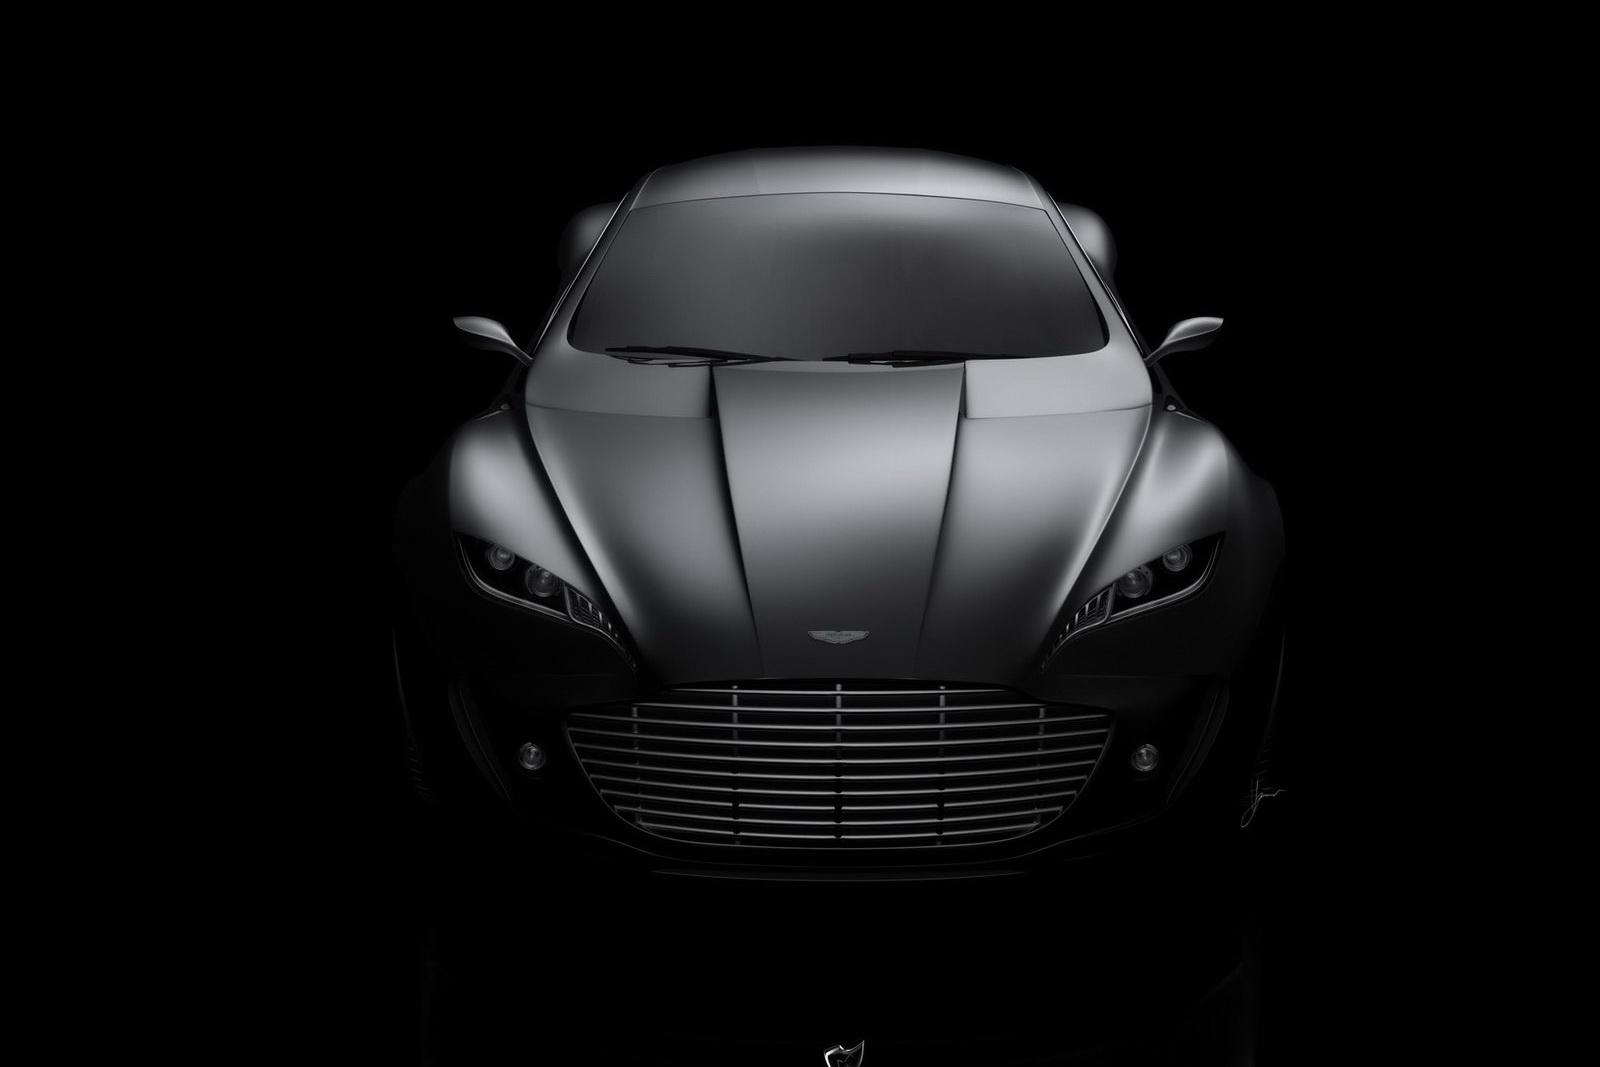 Aston Martin Gauntlet Concept NewCelicaorg Forum - Aston martin headlights